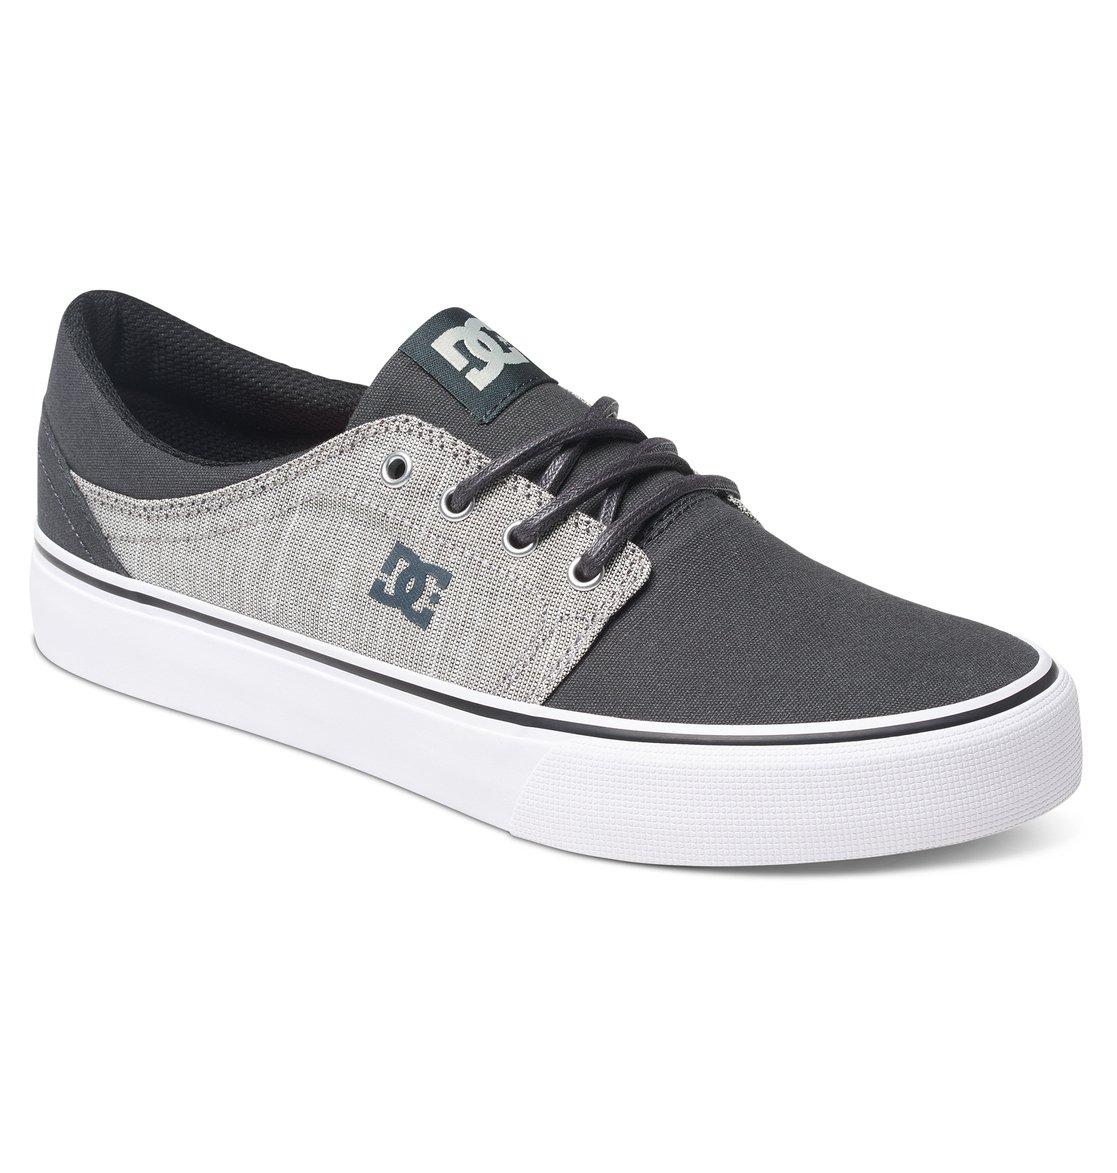 Buty Dc Trase Tx Se (Charcoal Grey) Ss17